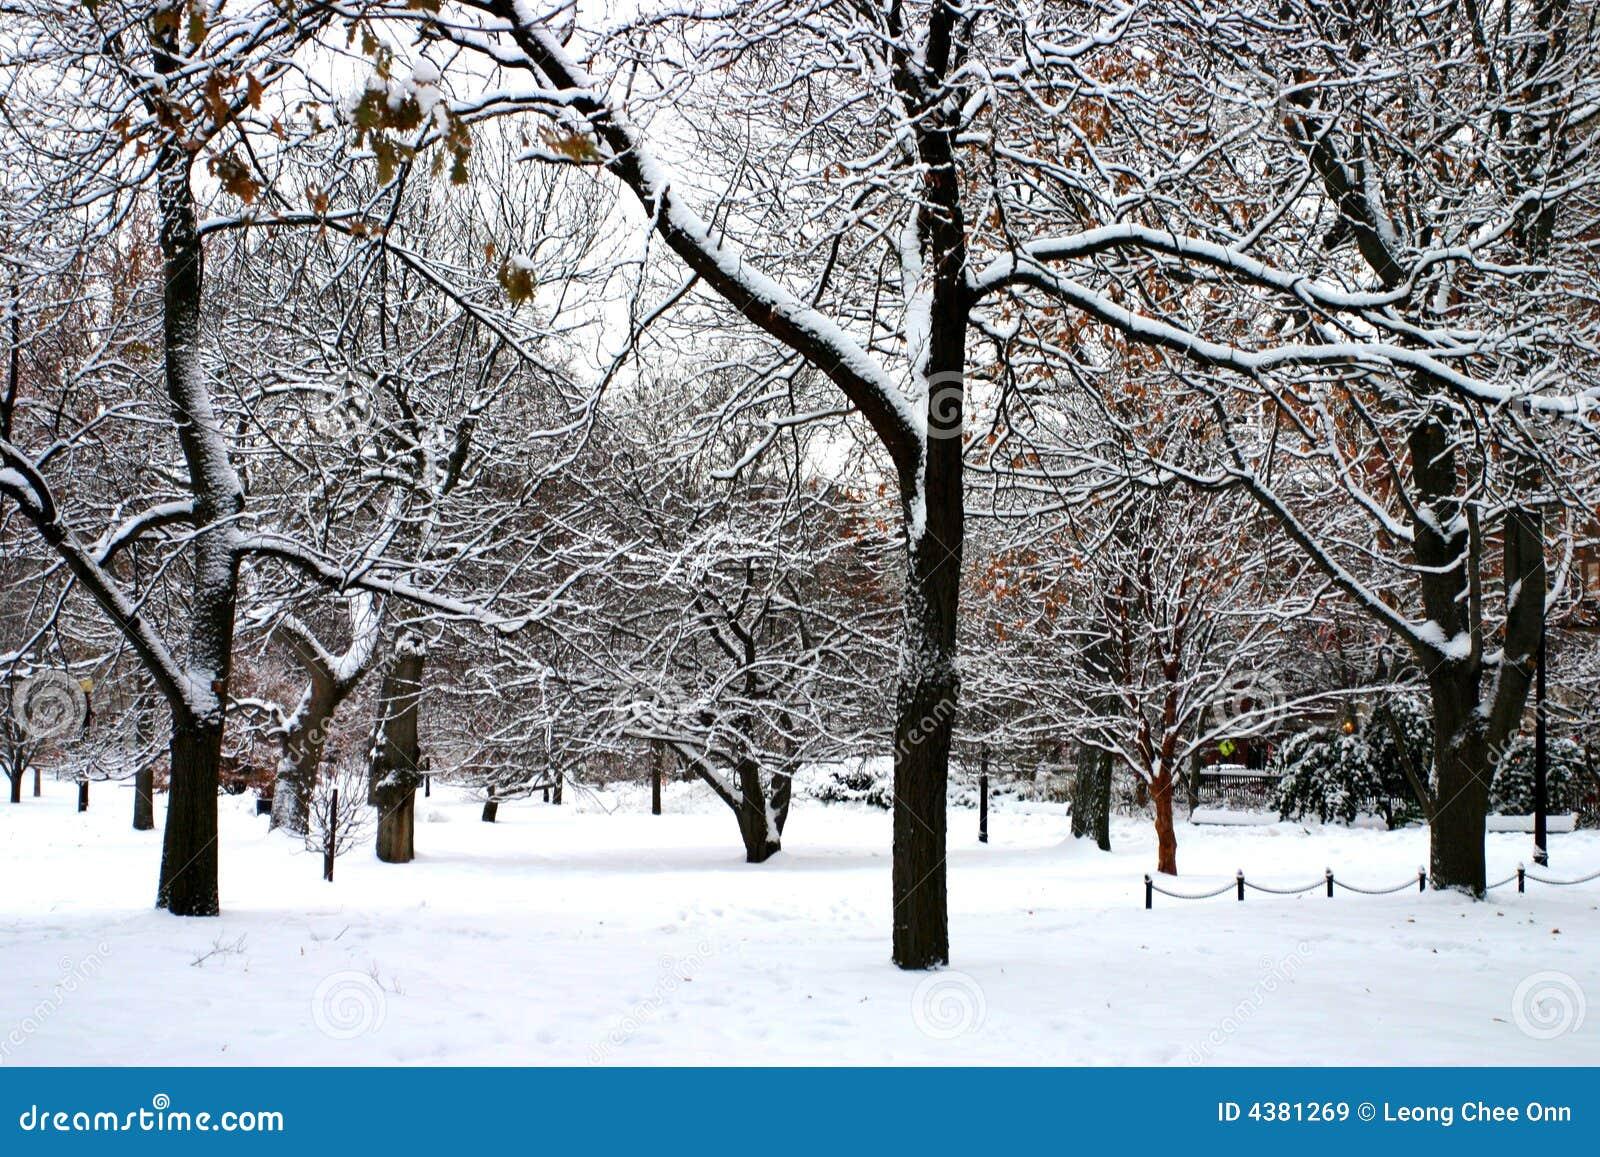 Stock image of a snowing winter at boston massachusetts usa